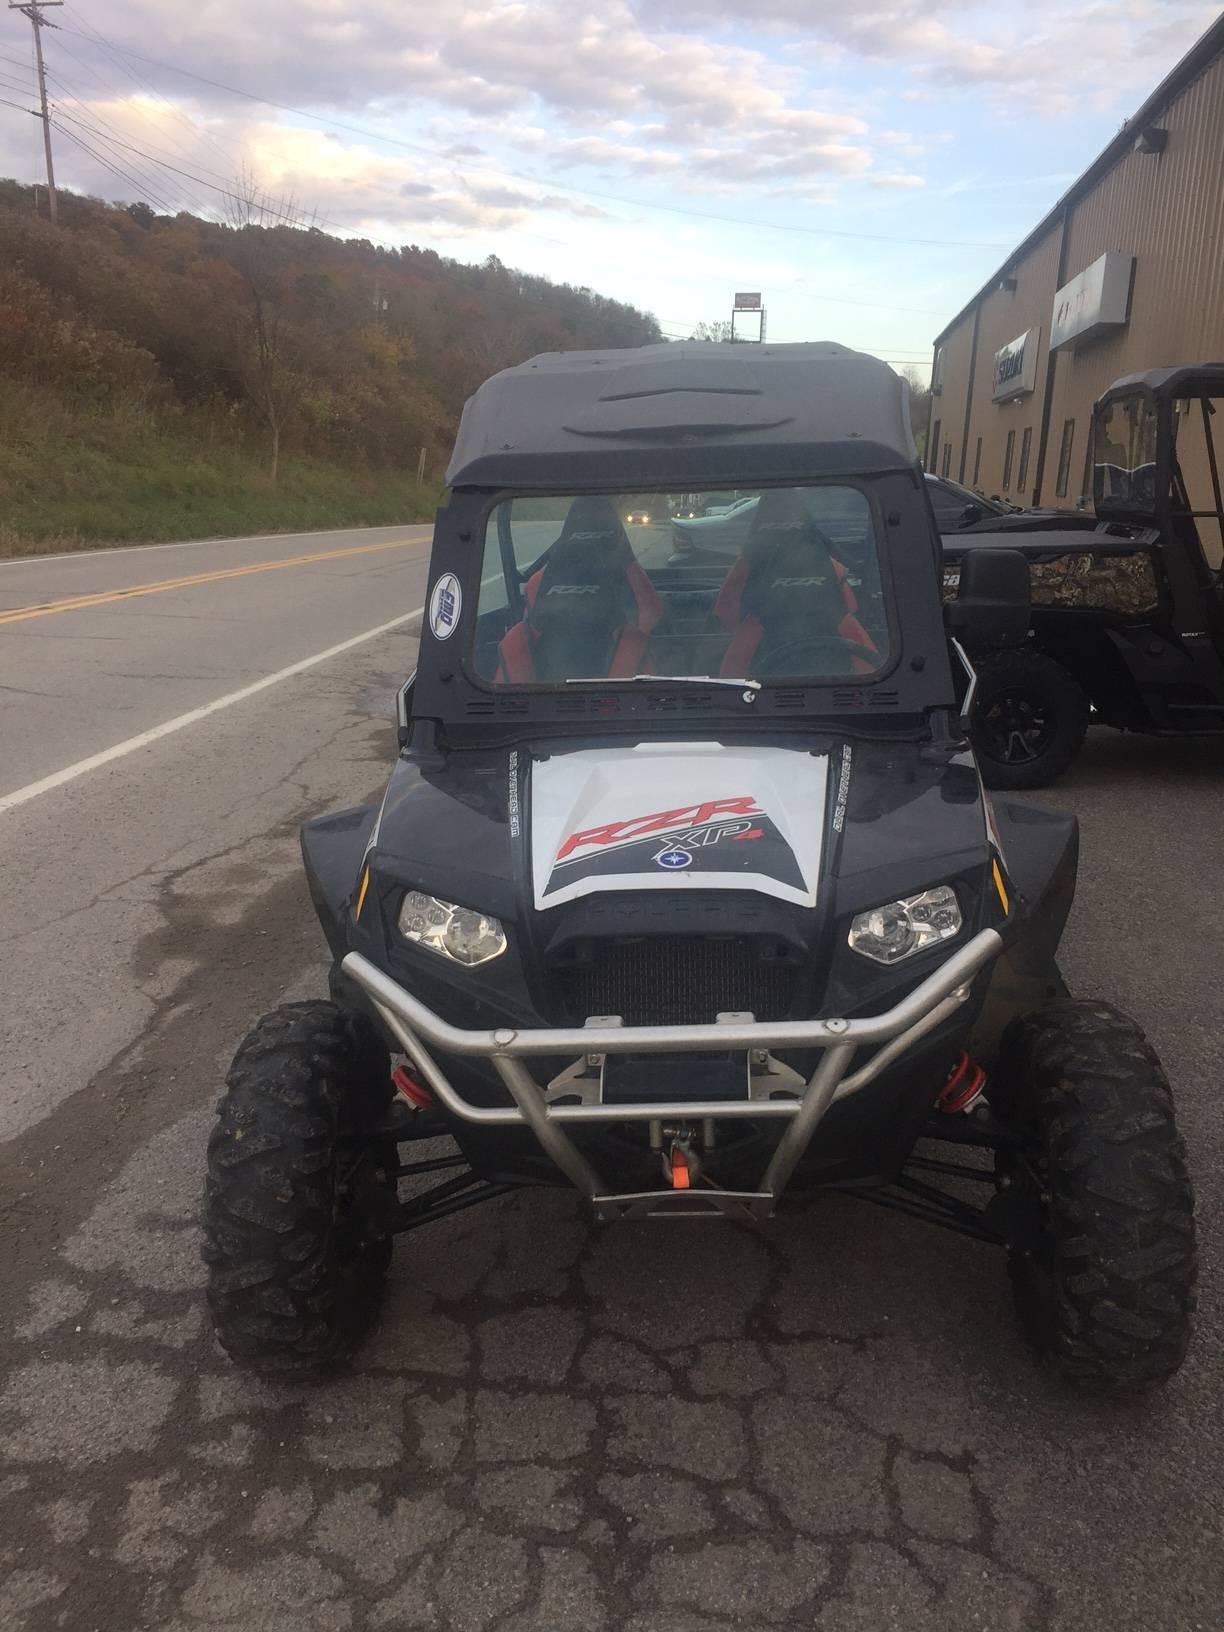 2013 Polaris RZR® XP 4 900 EPS LE in Claysville, Pennsylvania